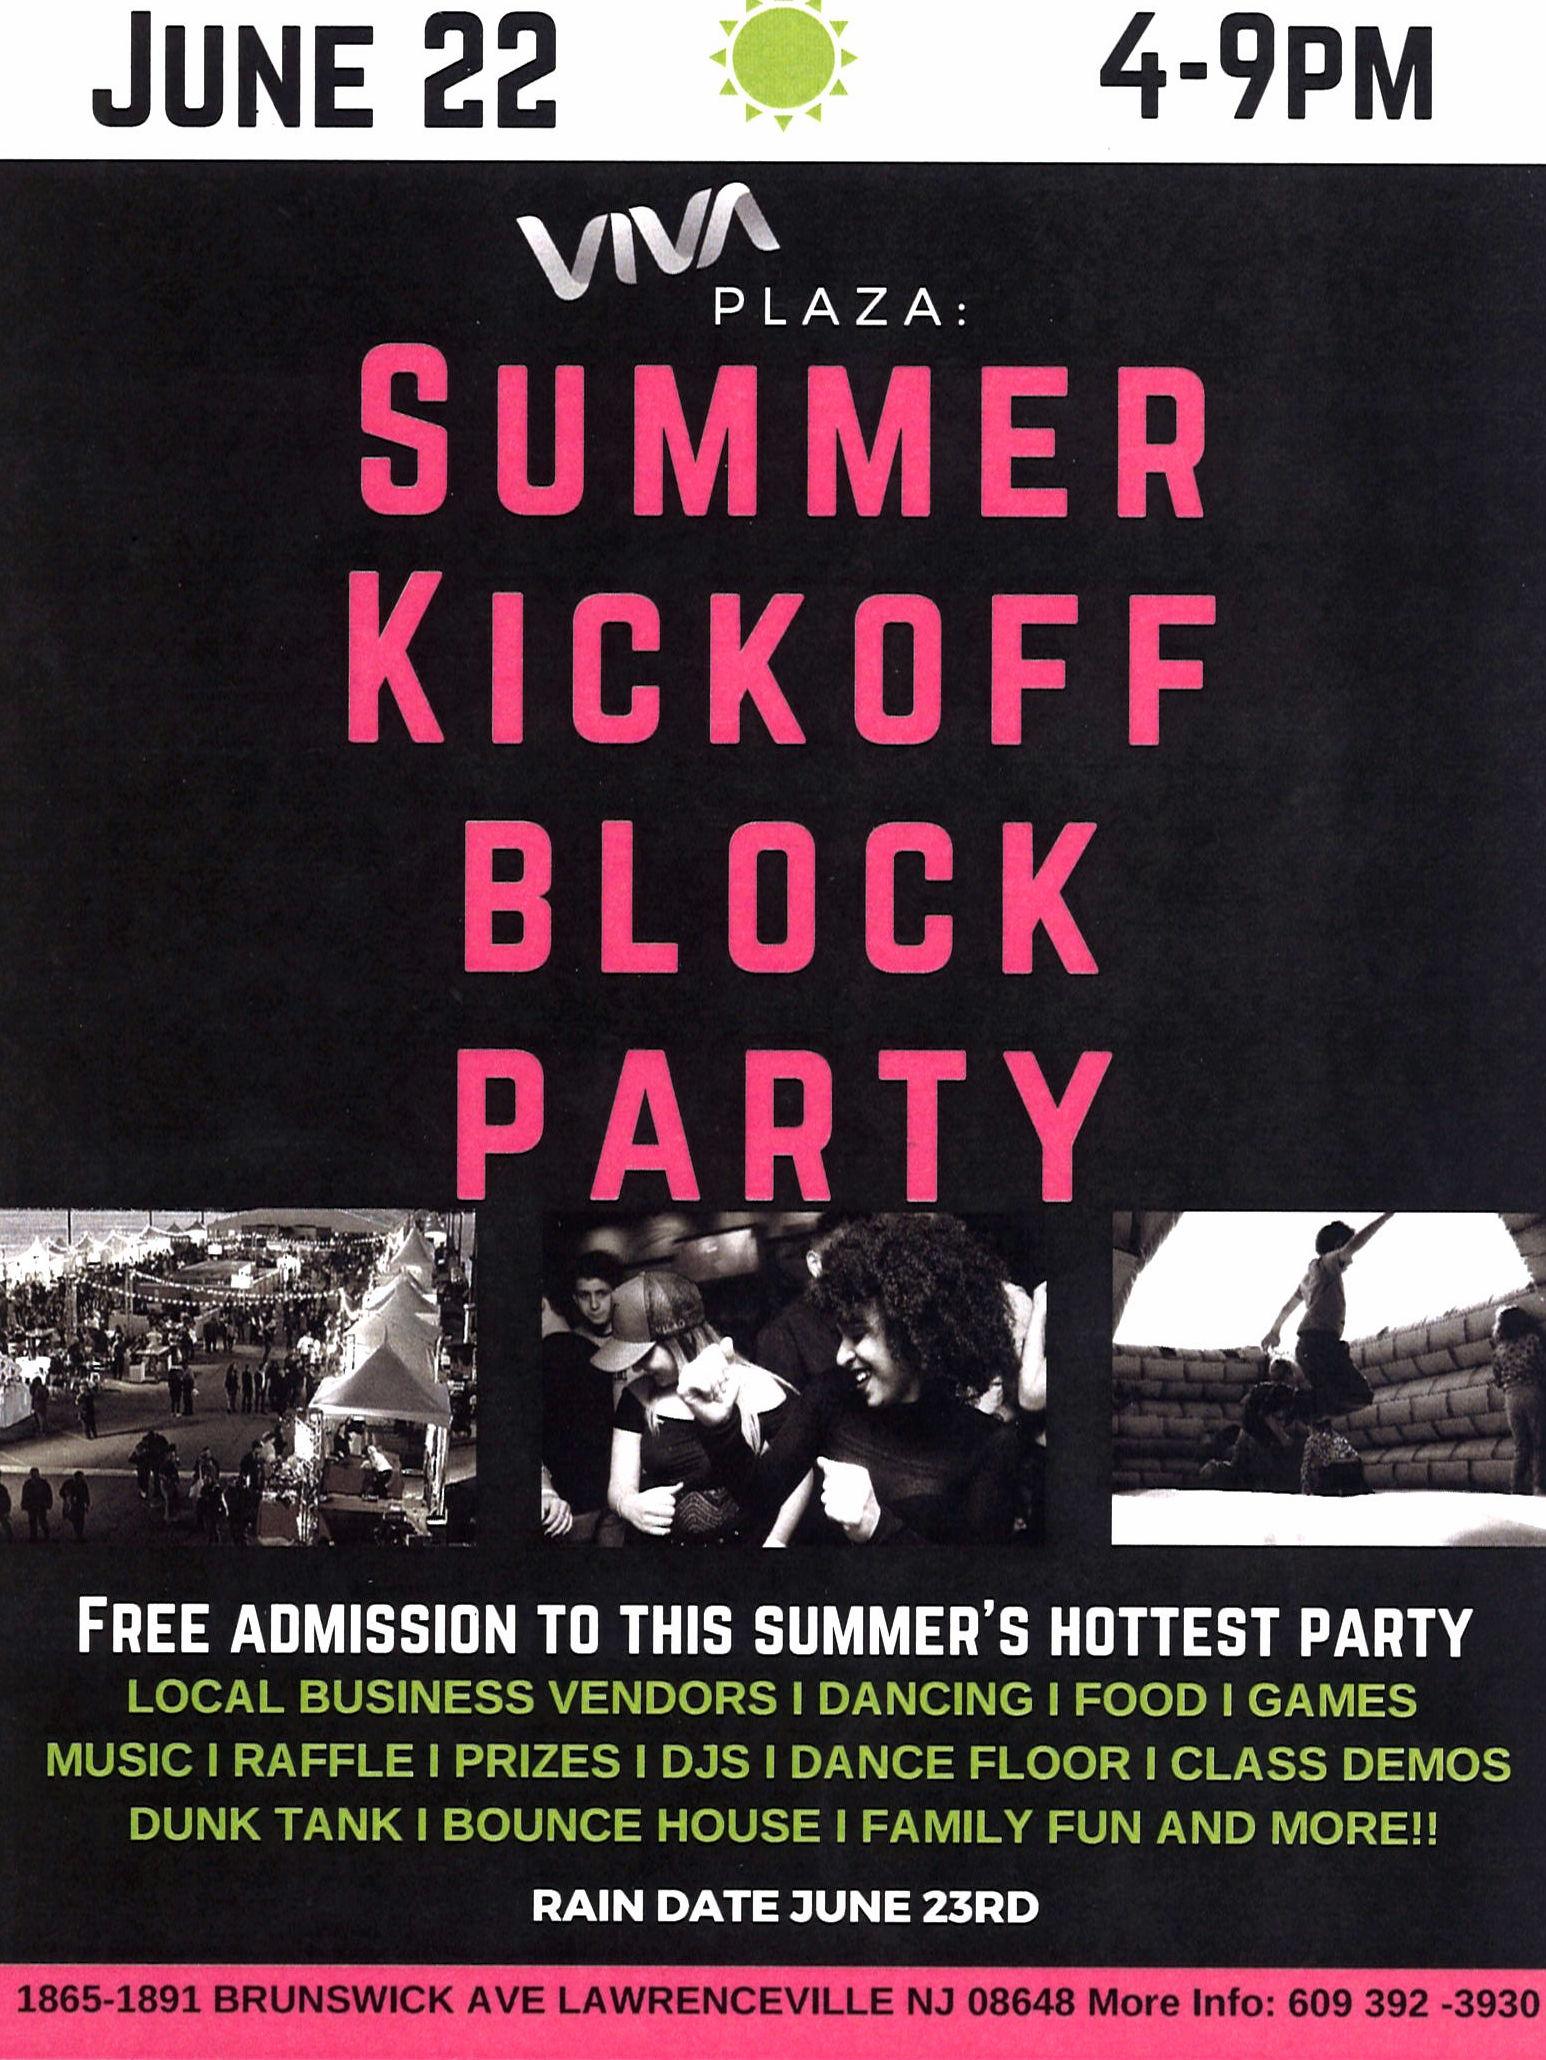 Ogłoszenie darmowe. Lokalizacja:  VIVA PLAZA - LAWRENCEVILLE. EVENTS - Others. SUMMER KICKOFF BLOCK PARTY.